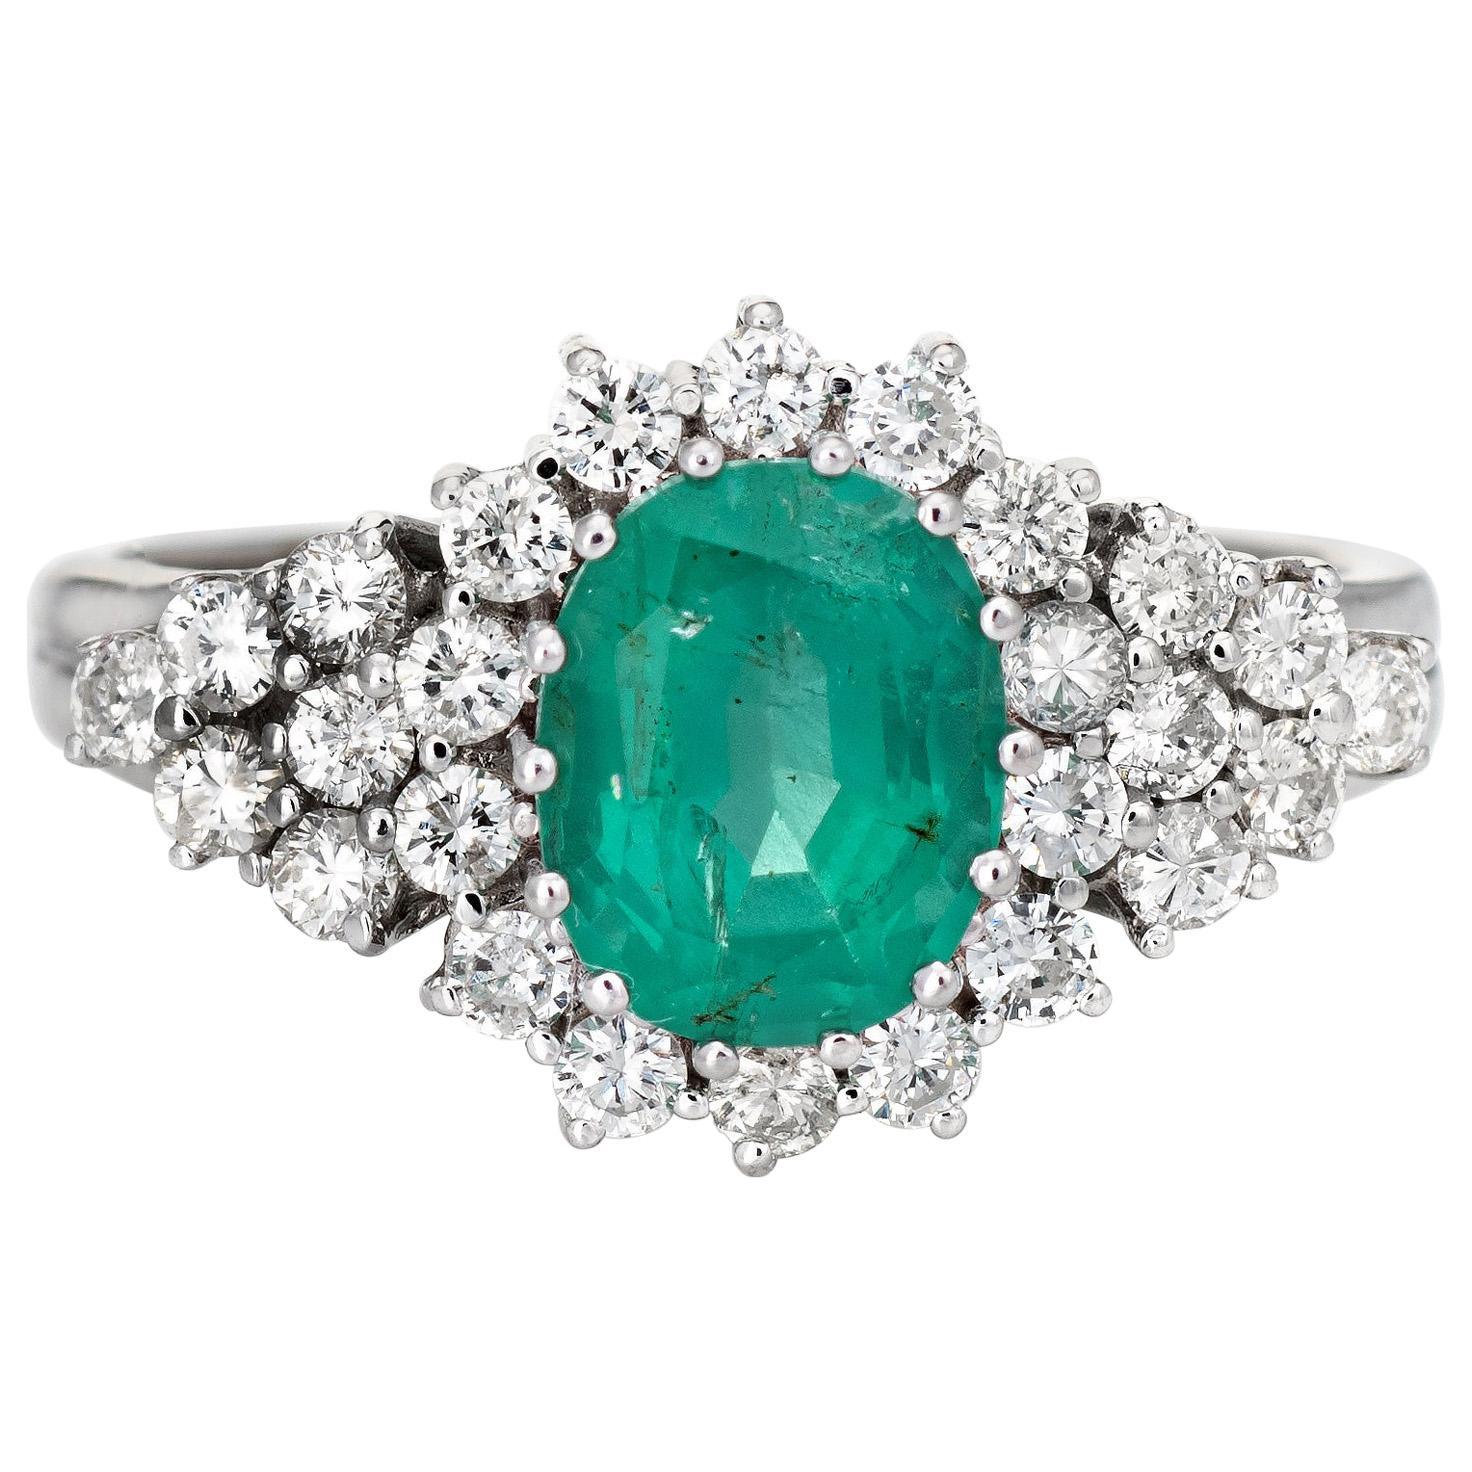 Emerald Diamond Ring Estate 14k White Gold Gemstone Engagement Jewelry